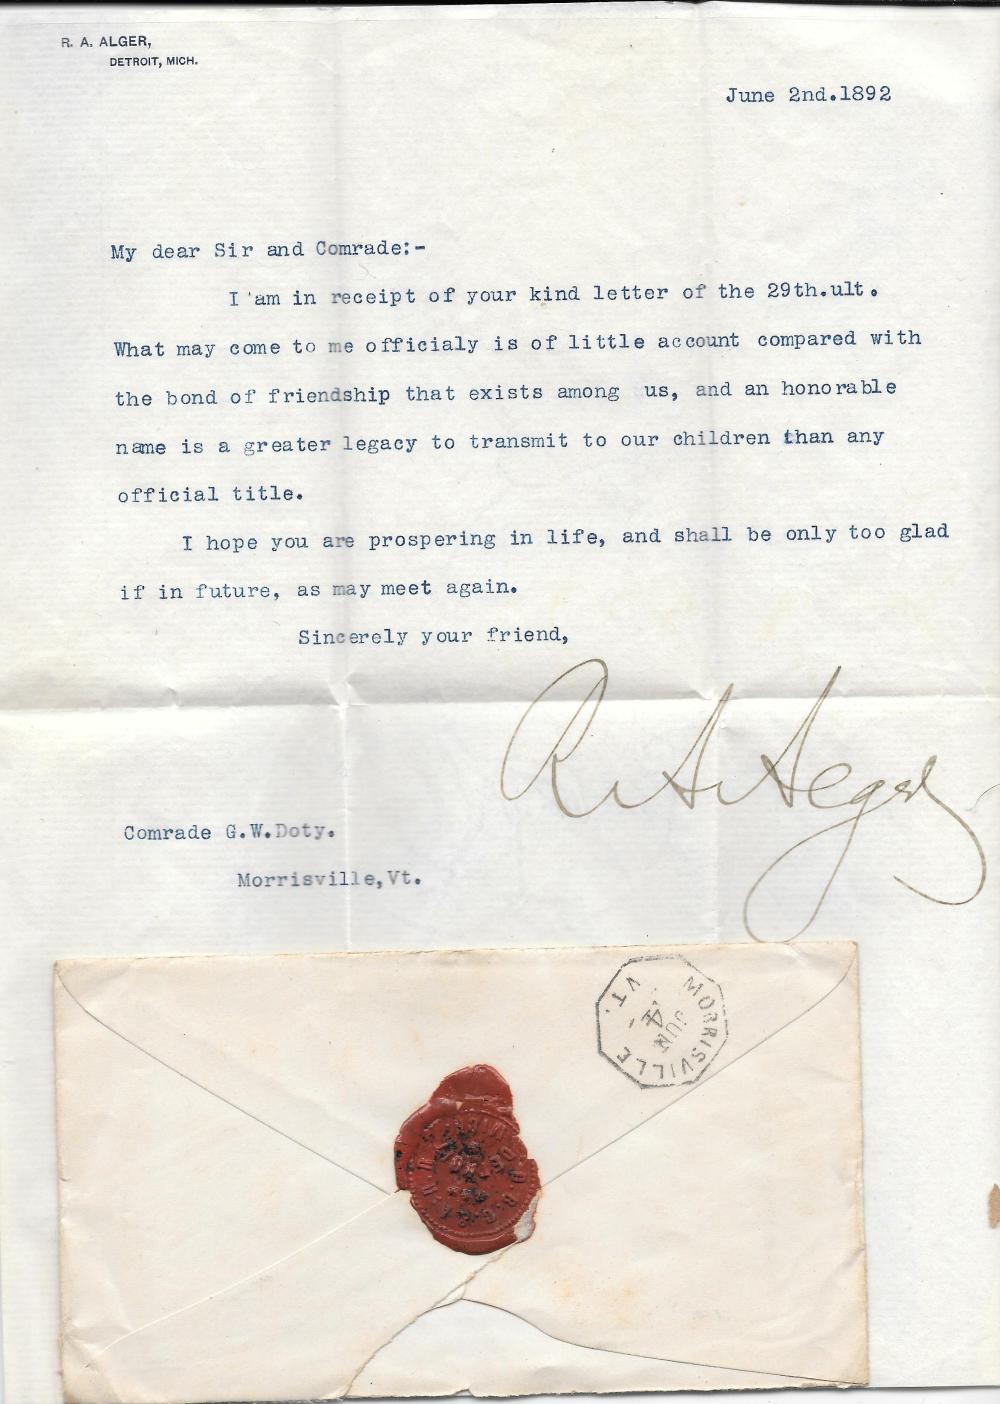 Uncommon railroad wax sealed letter